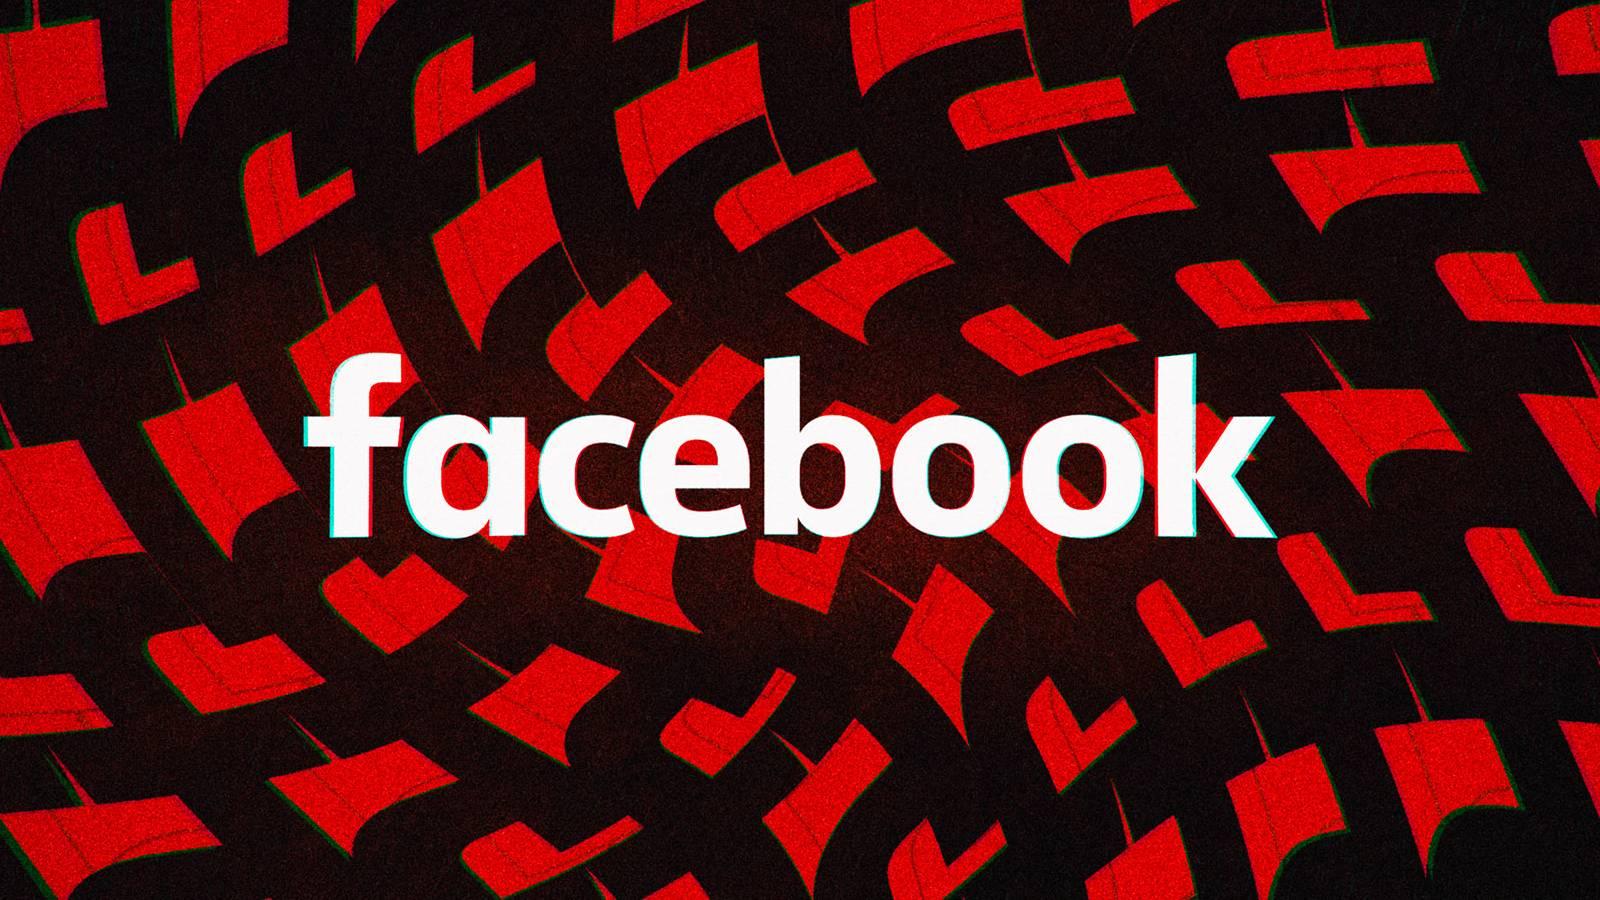 Facebook Noul Update pentru Telefoane Schimbari Aduce